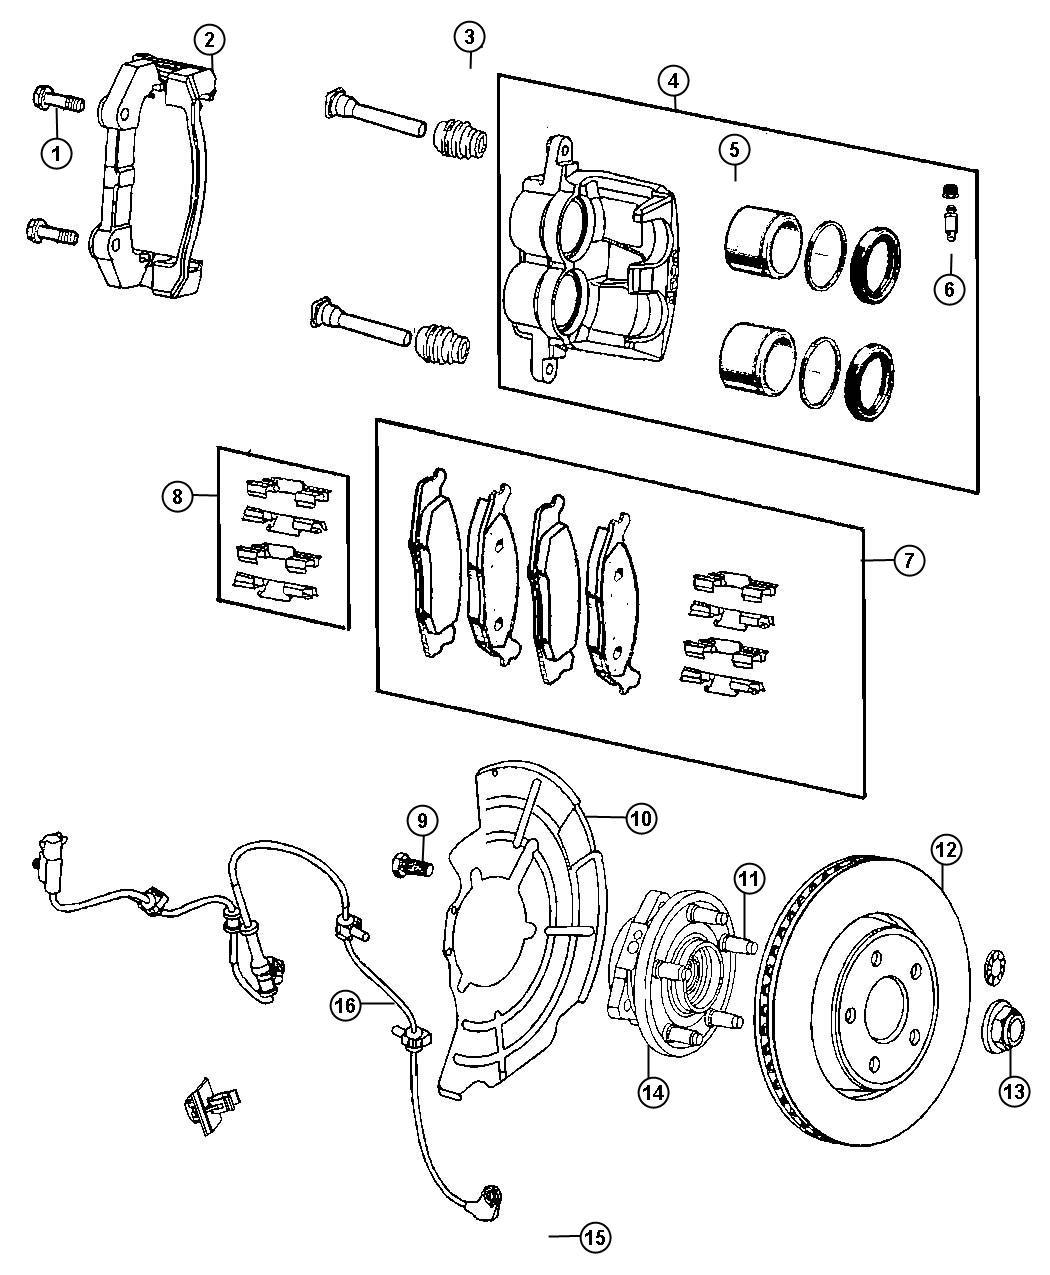 2014 Dodge Durango Rotor. Brake. Front. [bry], [x84], [bry